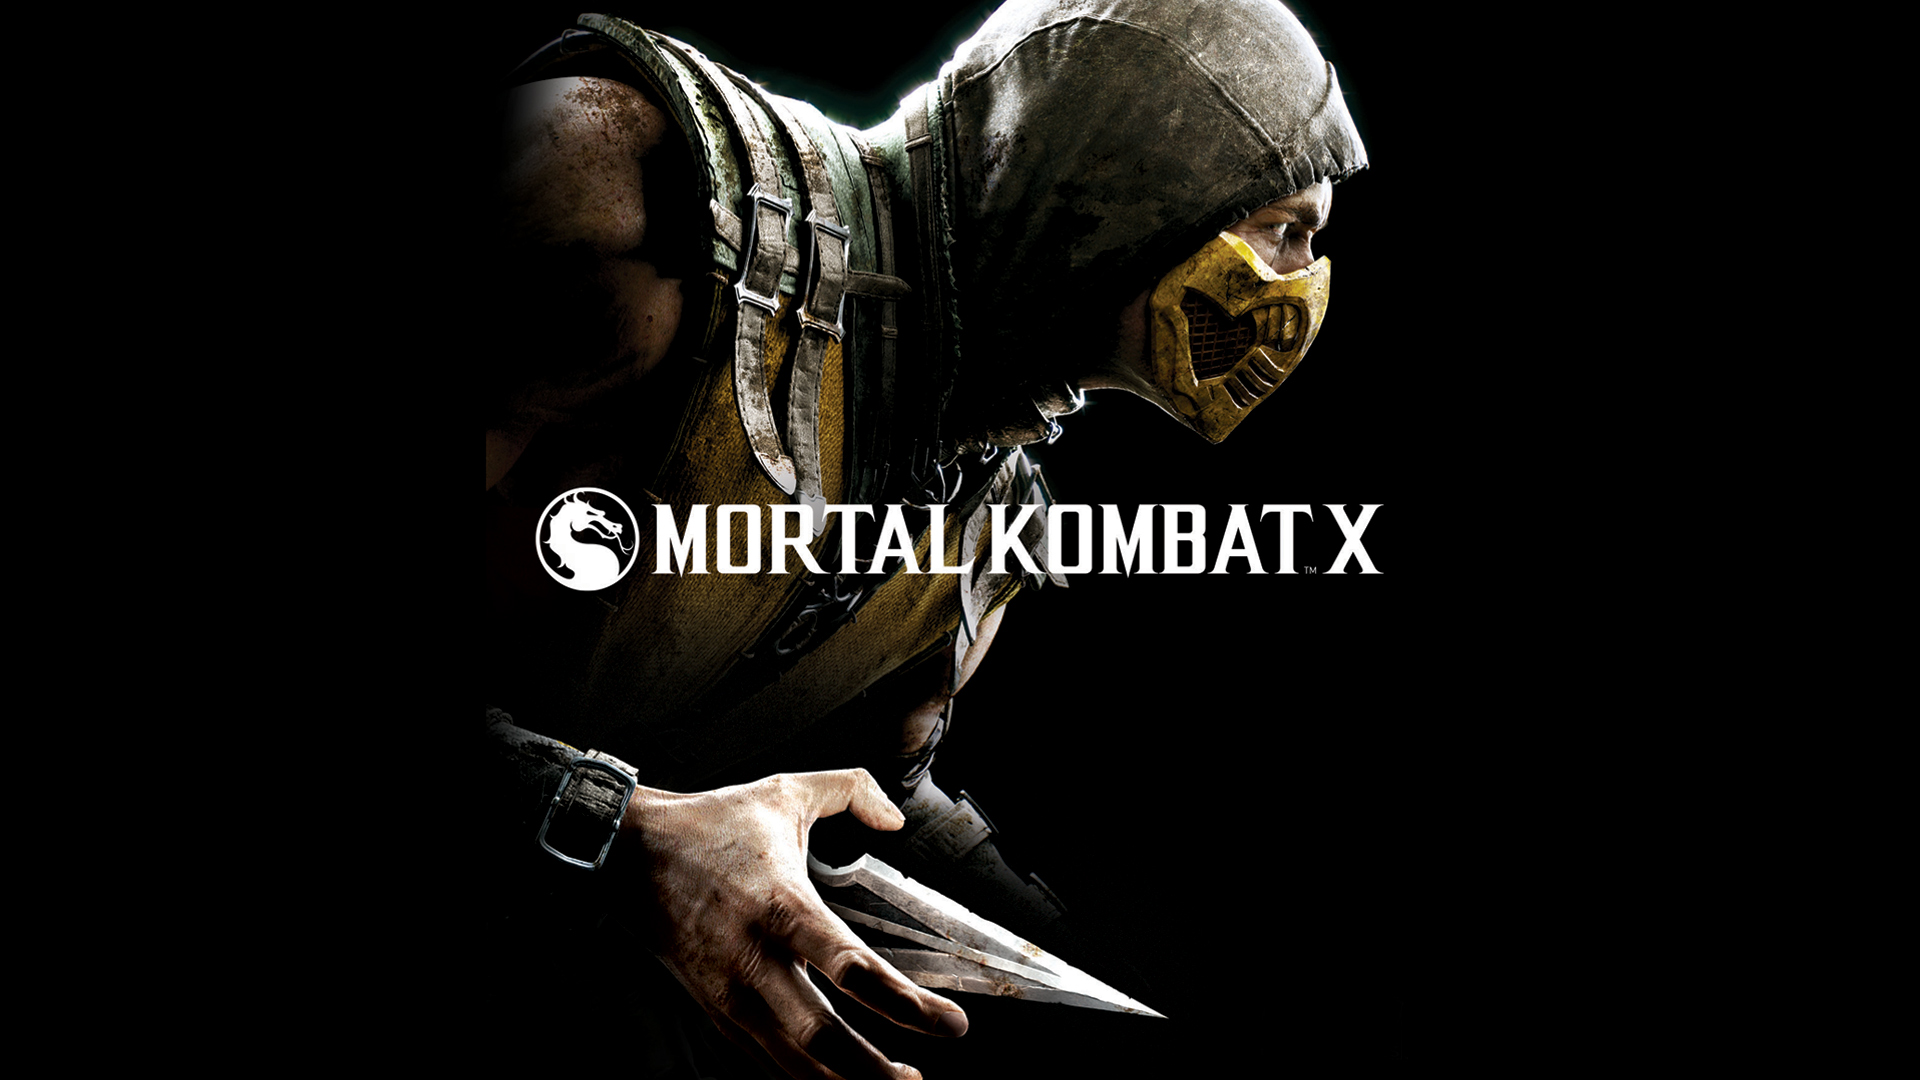 Mortal Kombat X Wallpapers: Mortal Kombat X Wallpaper 1080p